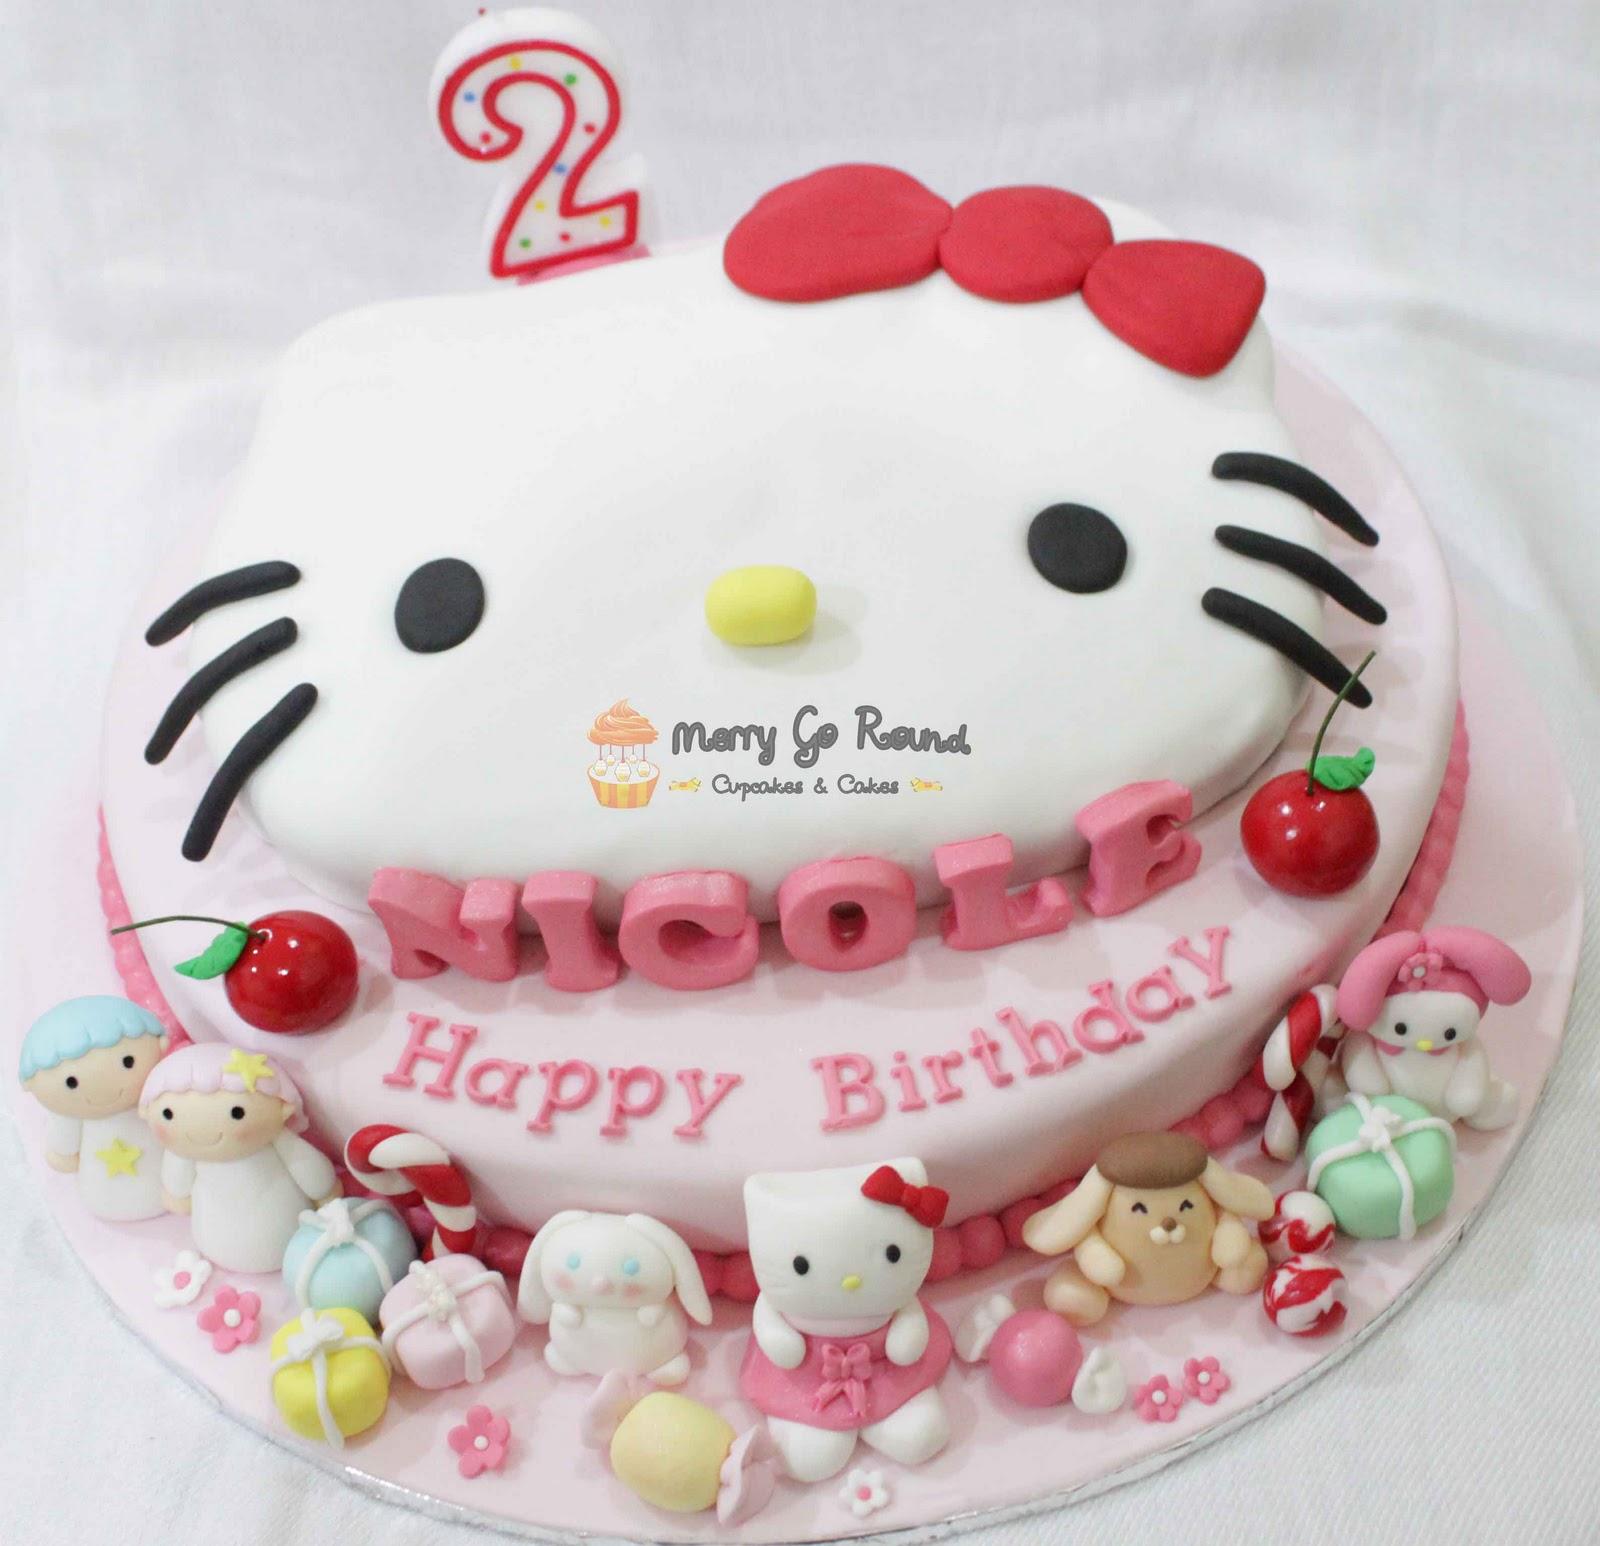 birthday cakes di jakarta 1 on birthday cakes di jakarta